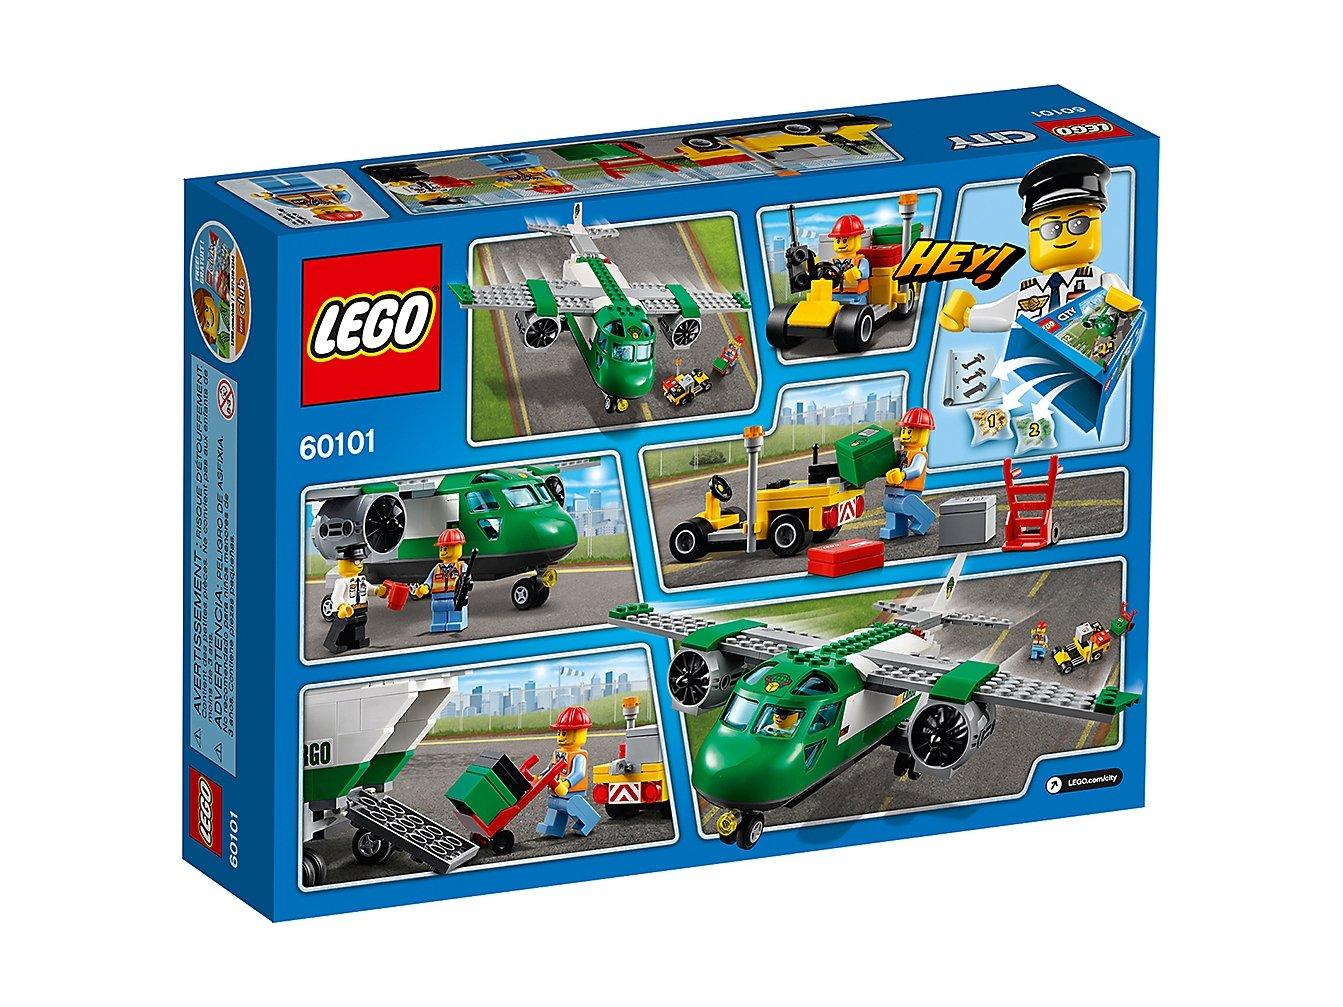 LEGO 60101 City Samolot transportowy